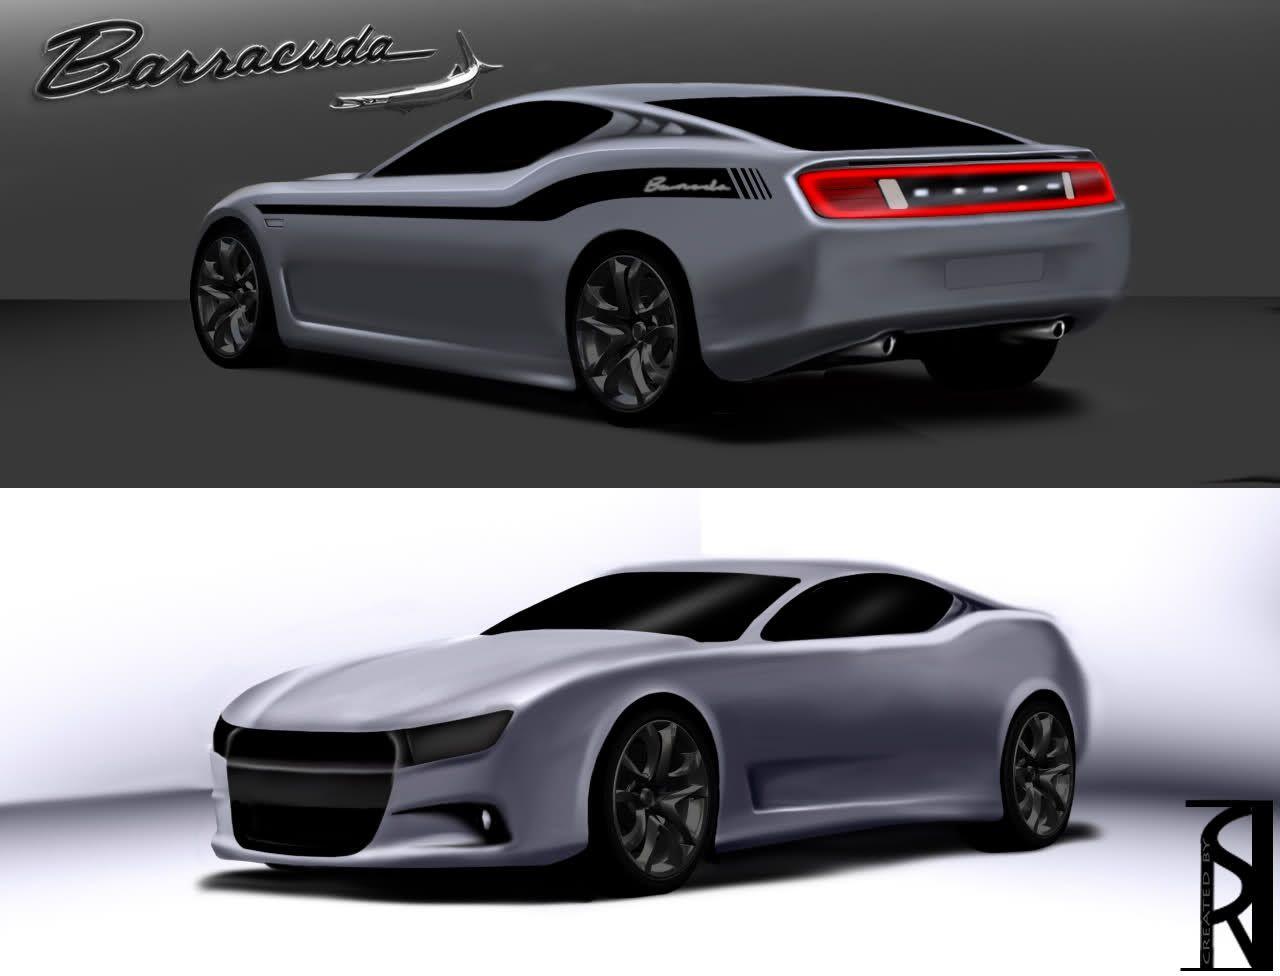 Dodge Barracuda 2015 >> Dodge Barracuda 2015 Sketch Pic My Likes Cars Dodge